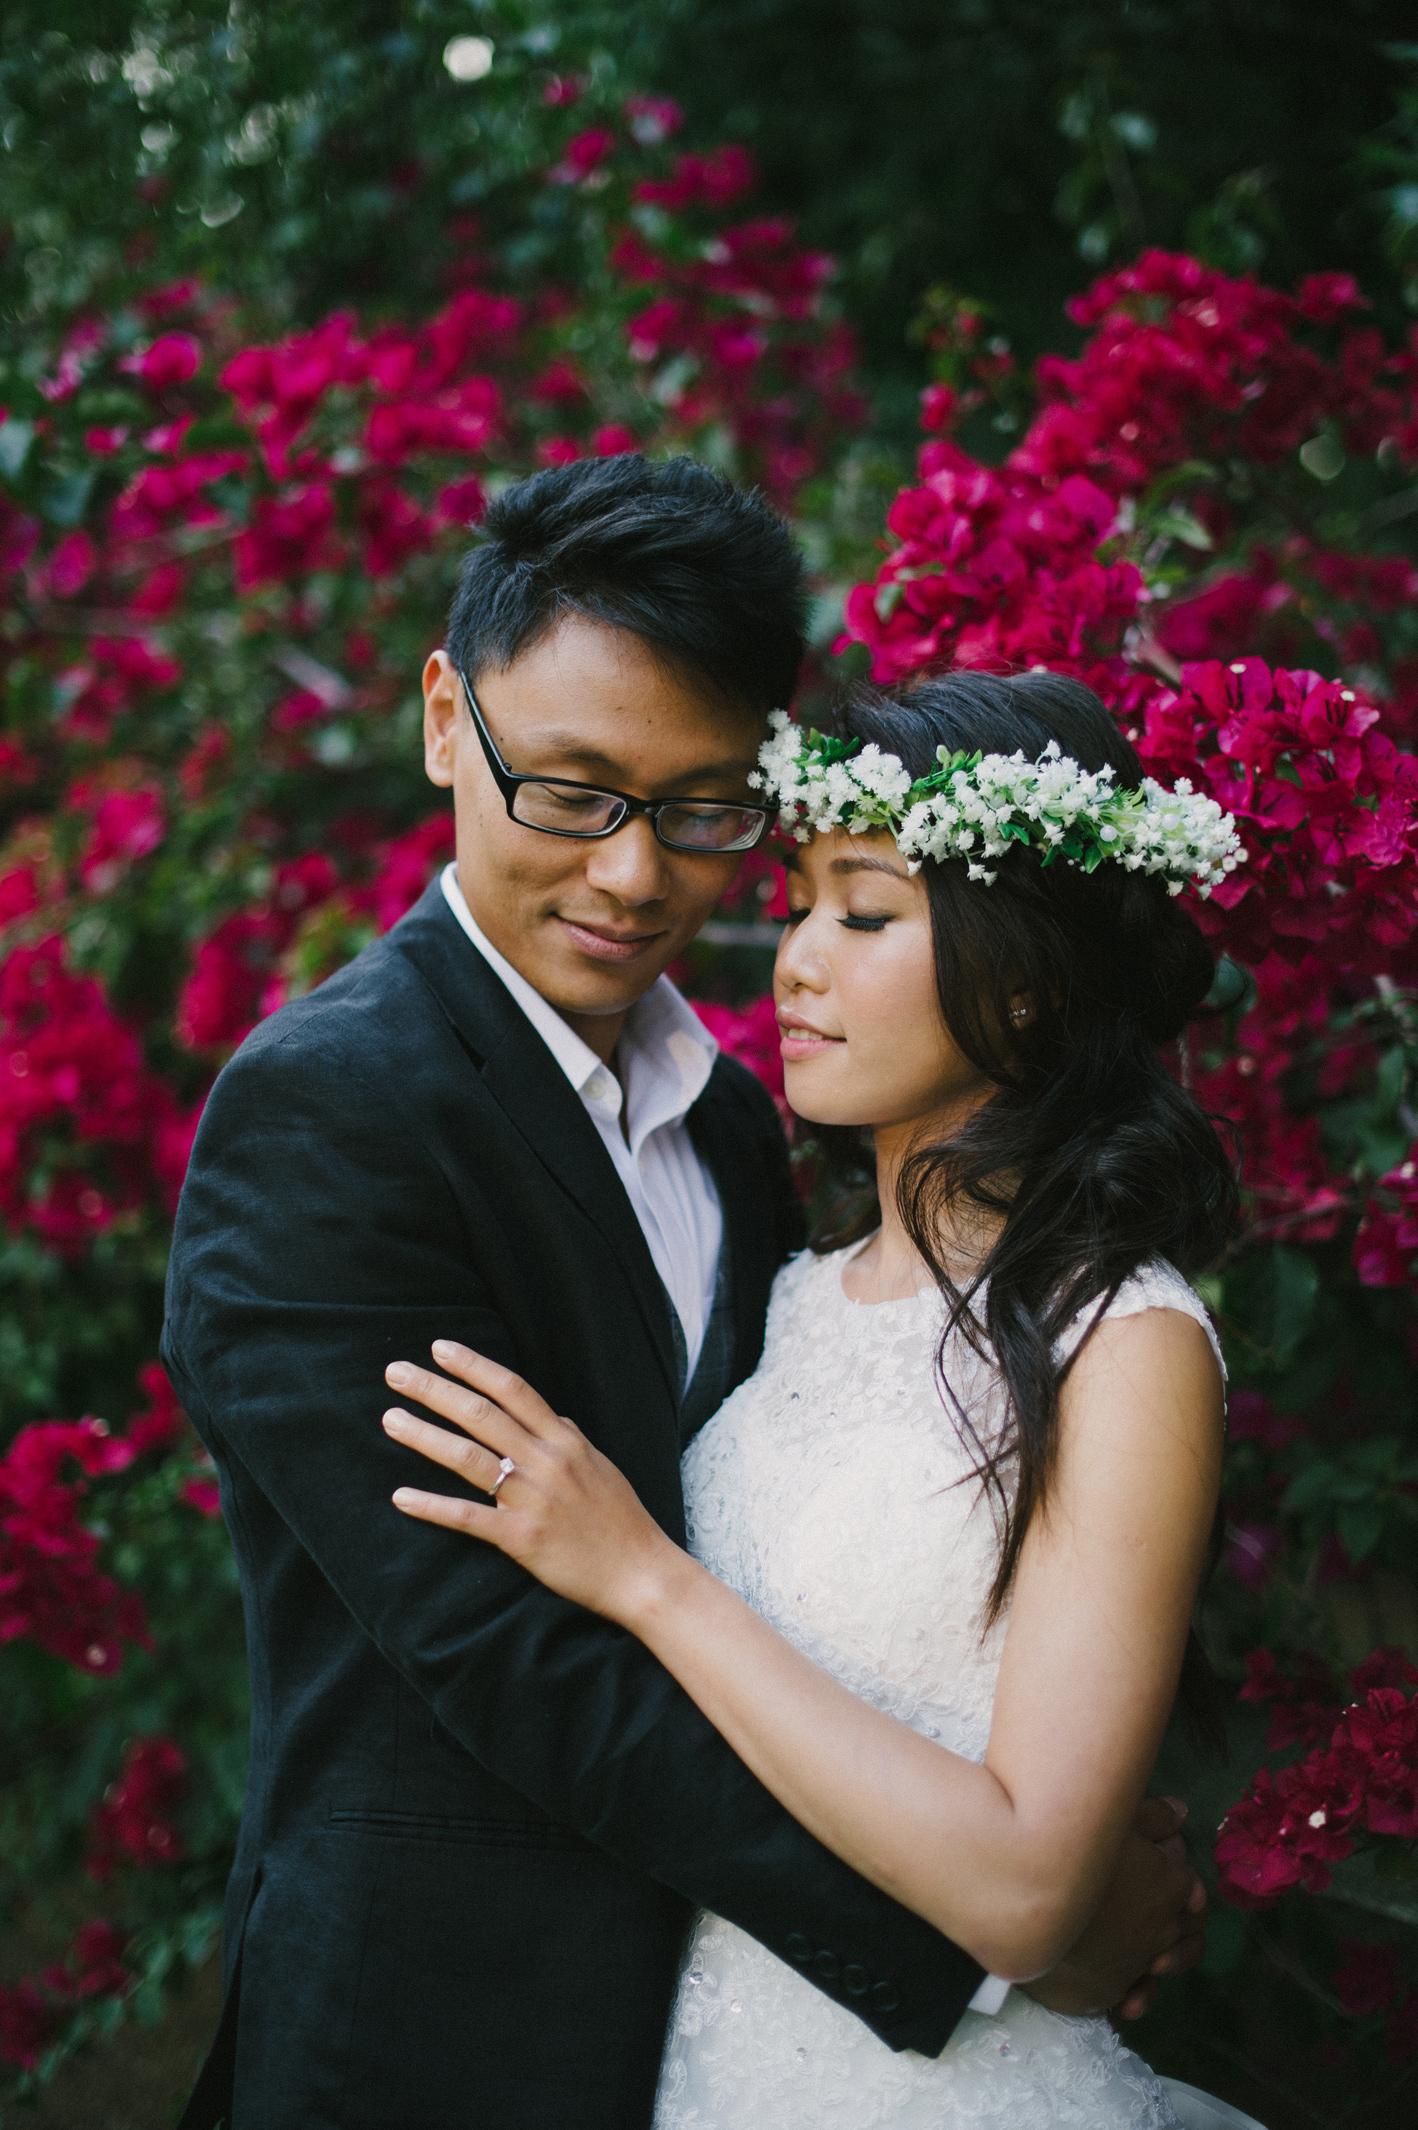 016-ed-janet-currumbin-wedding_sophie-baker-photography